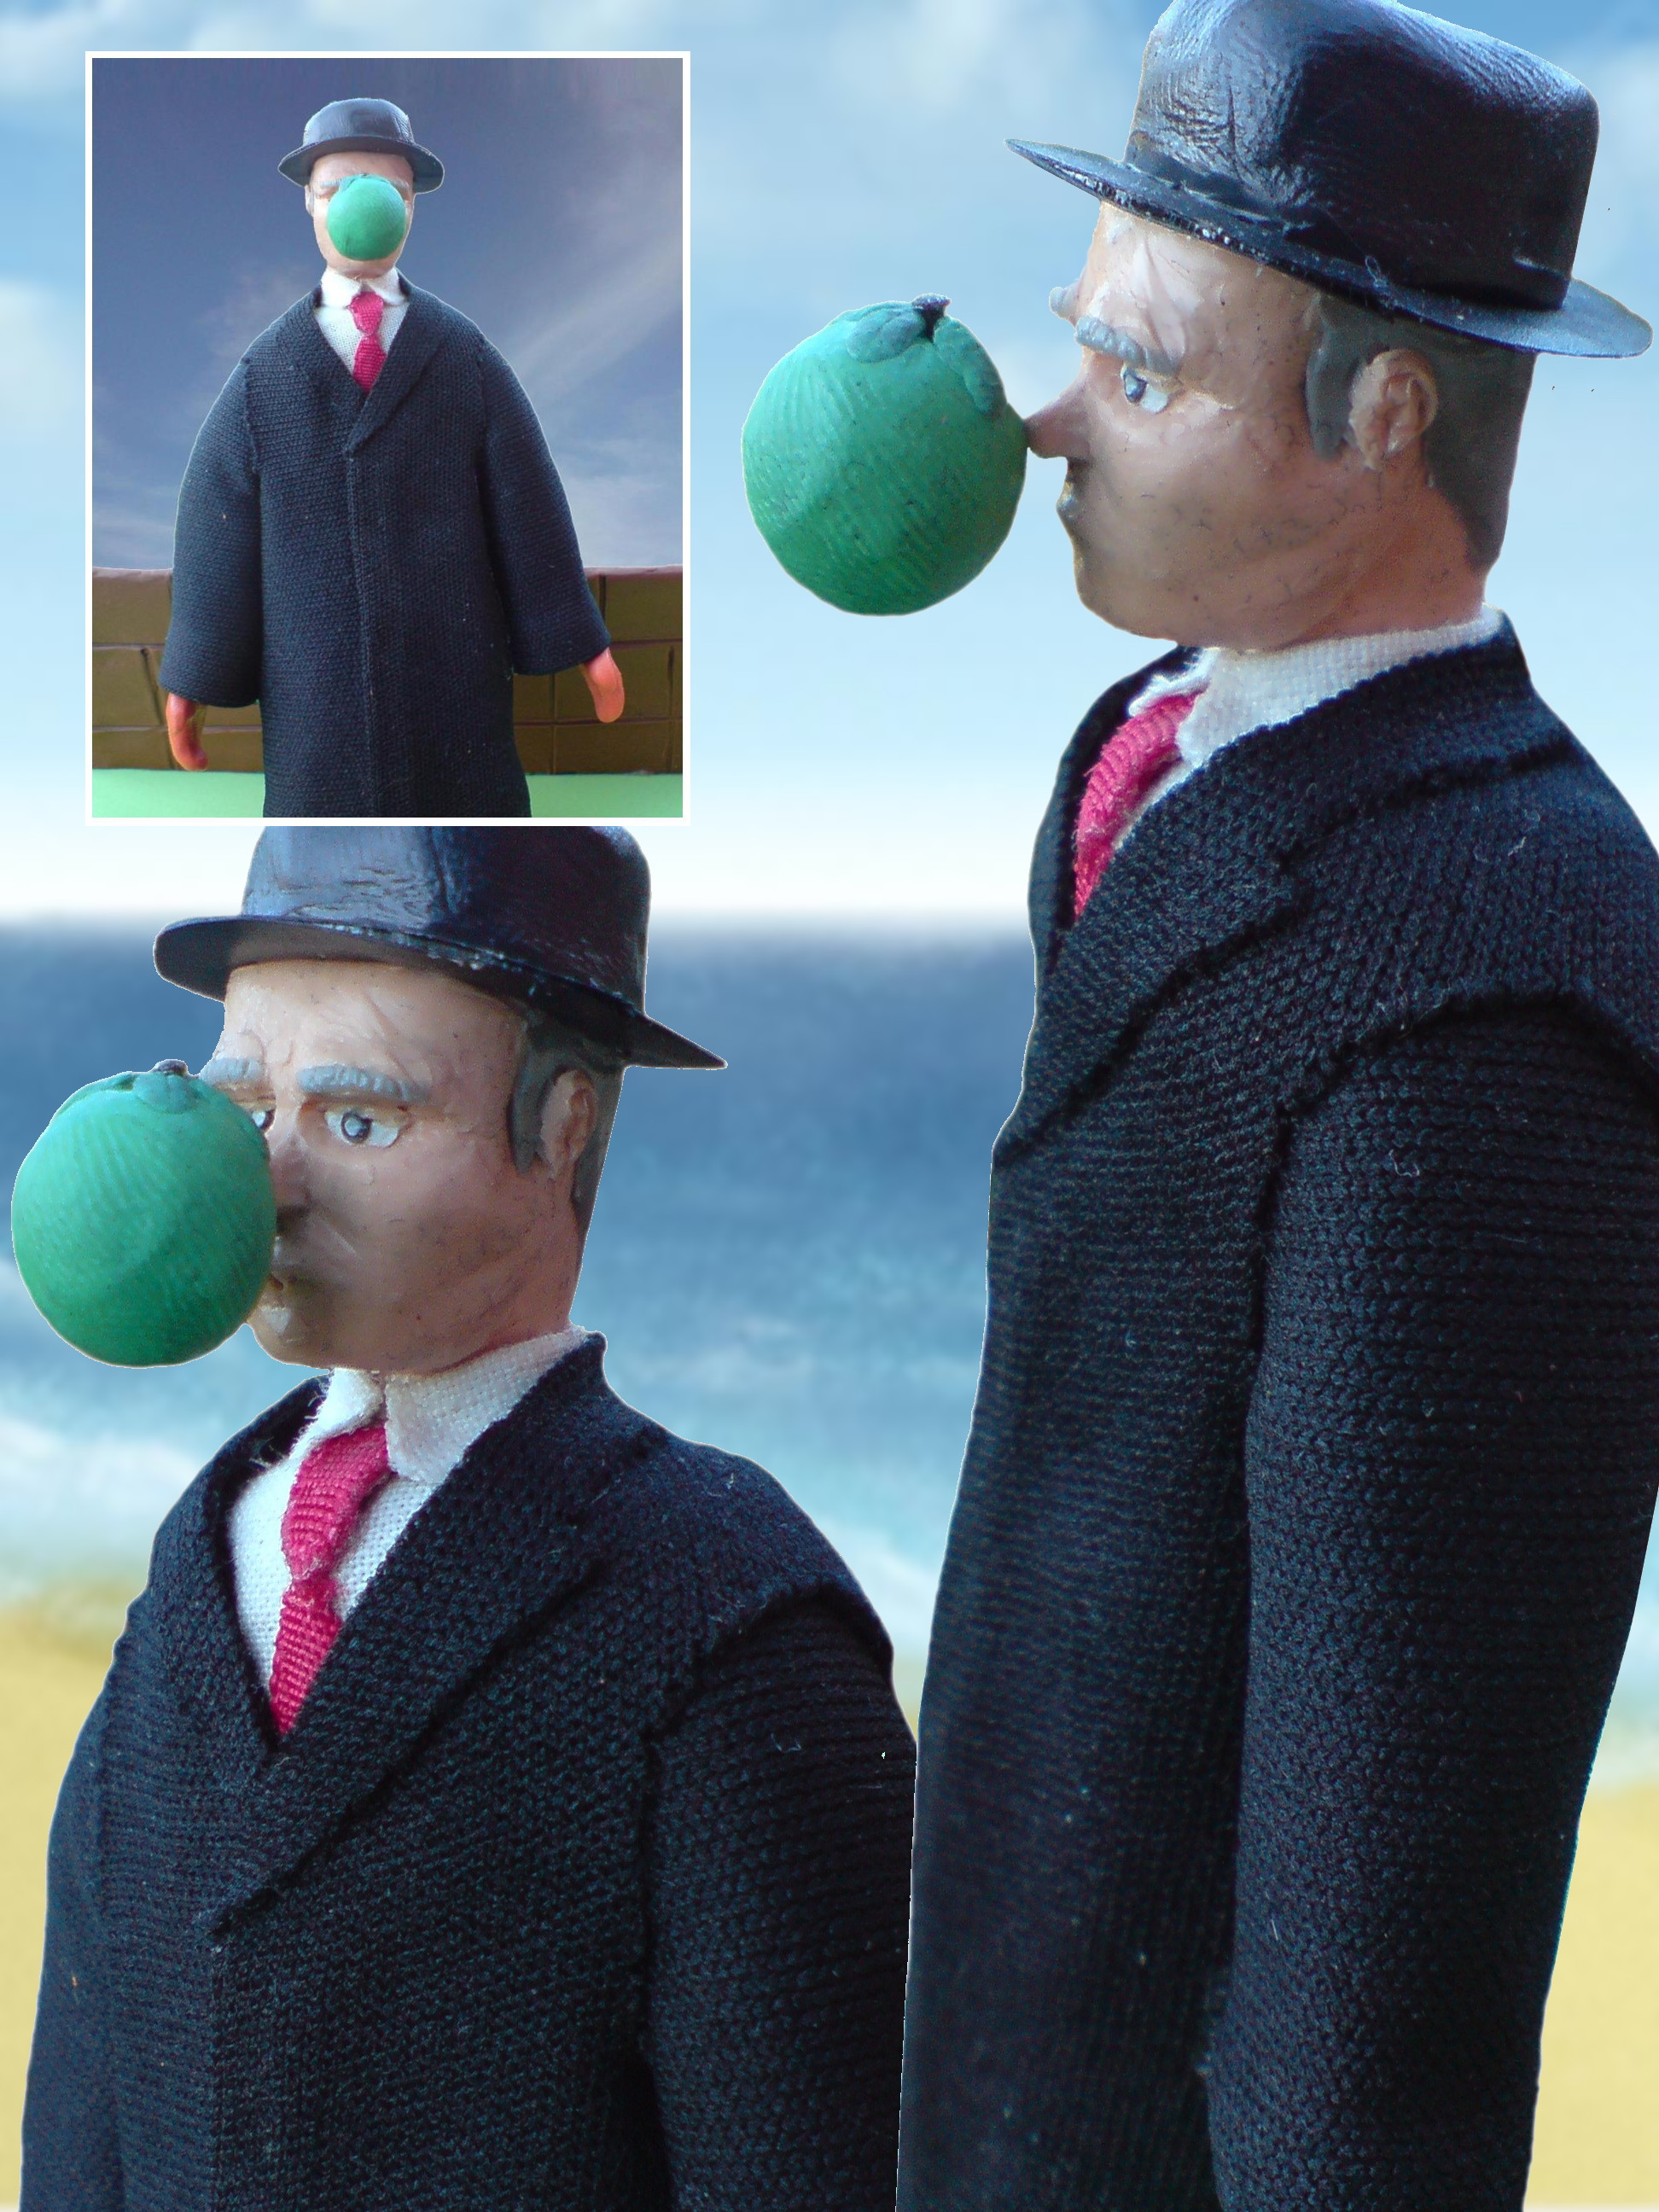 Rene Magritte: 'Son of man'